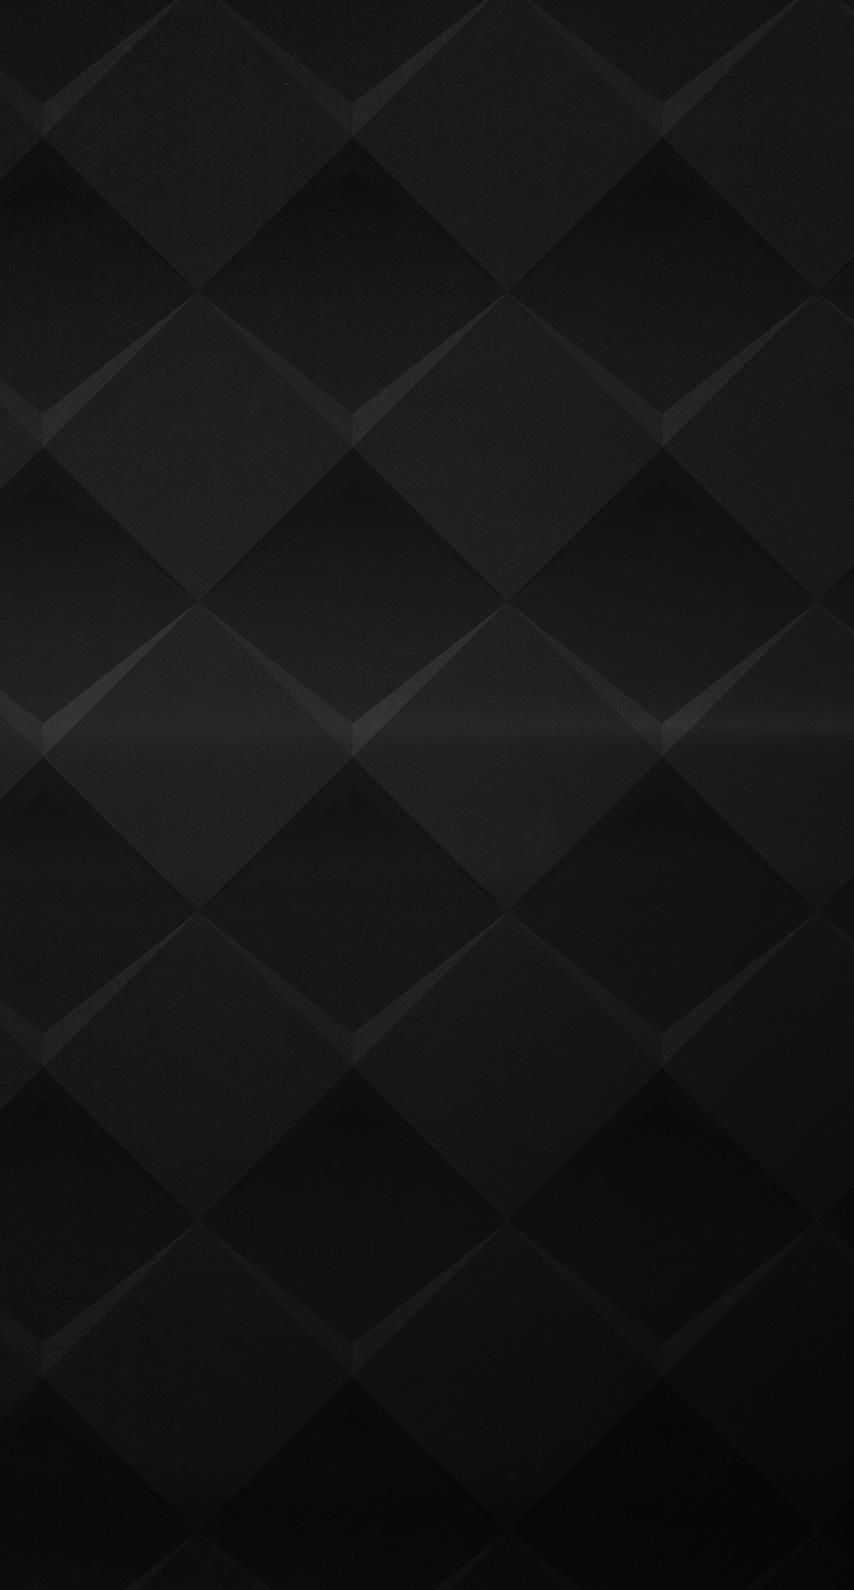 geometric, squares